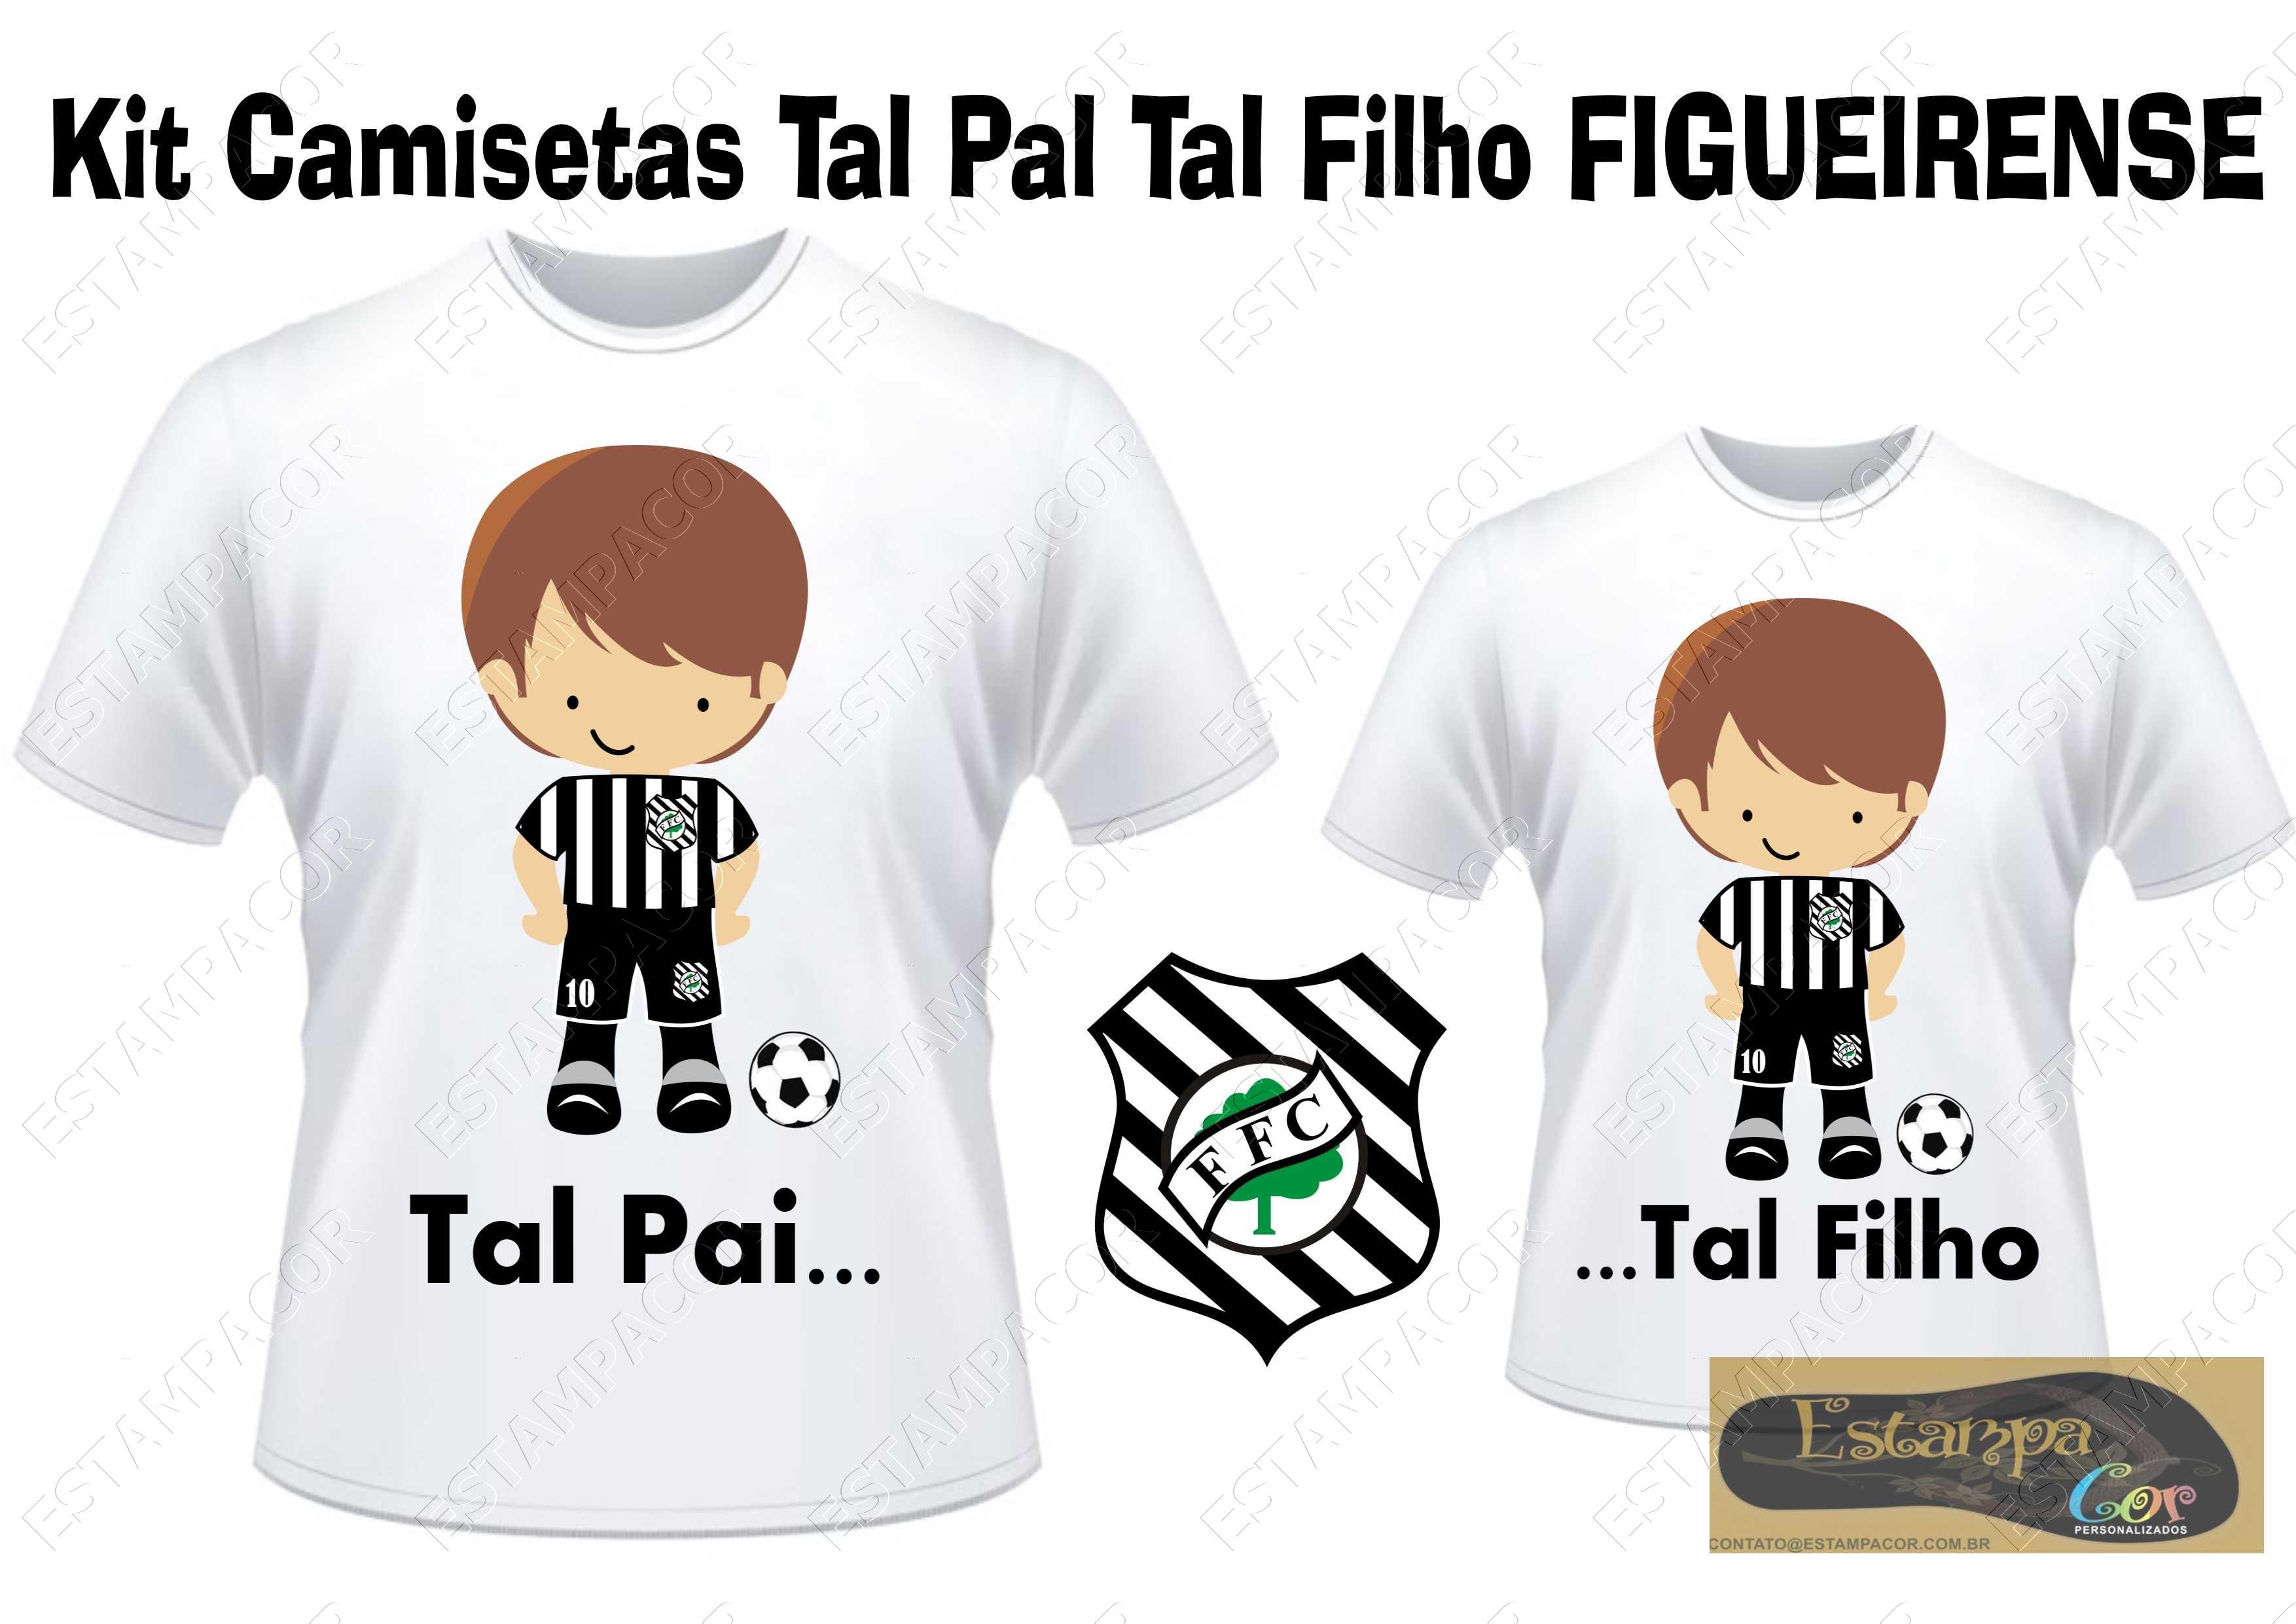 Camiseta Personalizada Tal Pai Tal Filho Figueirense (monte o seu Kit)